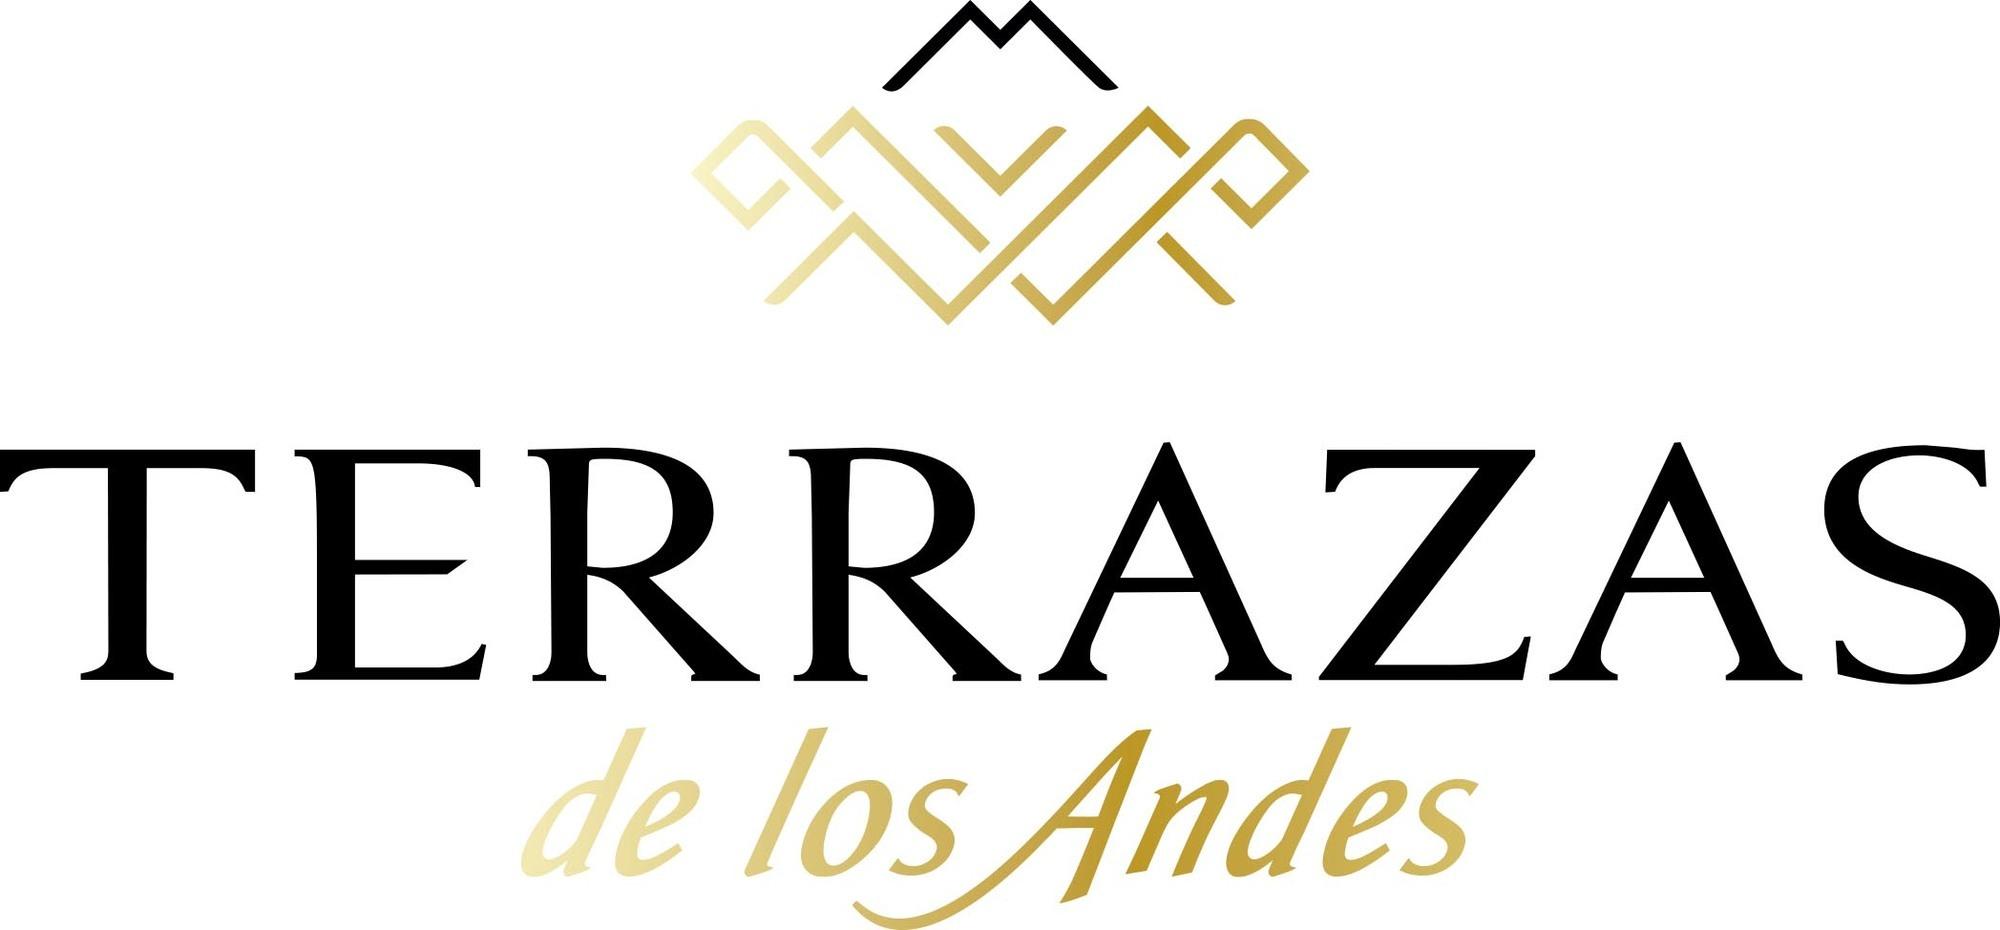 Tda nuevo logo